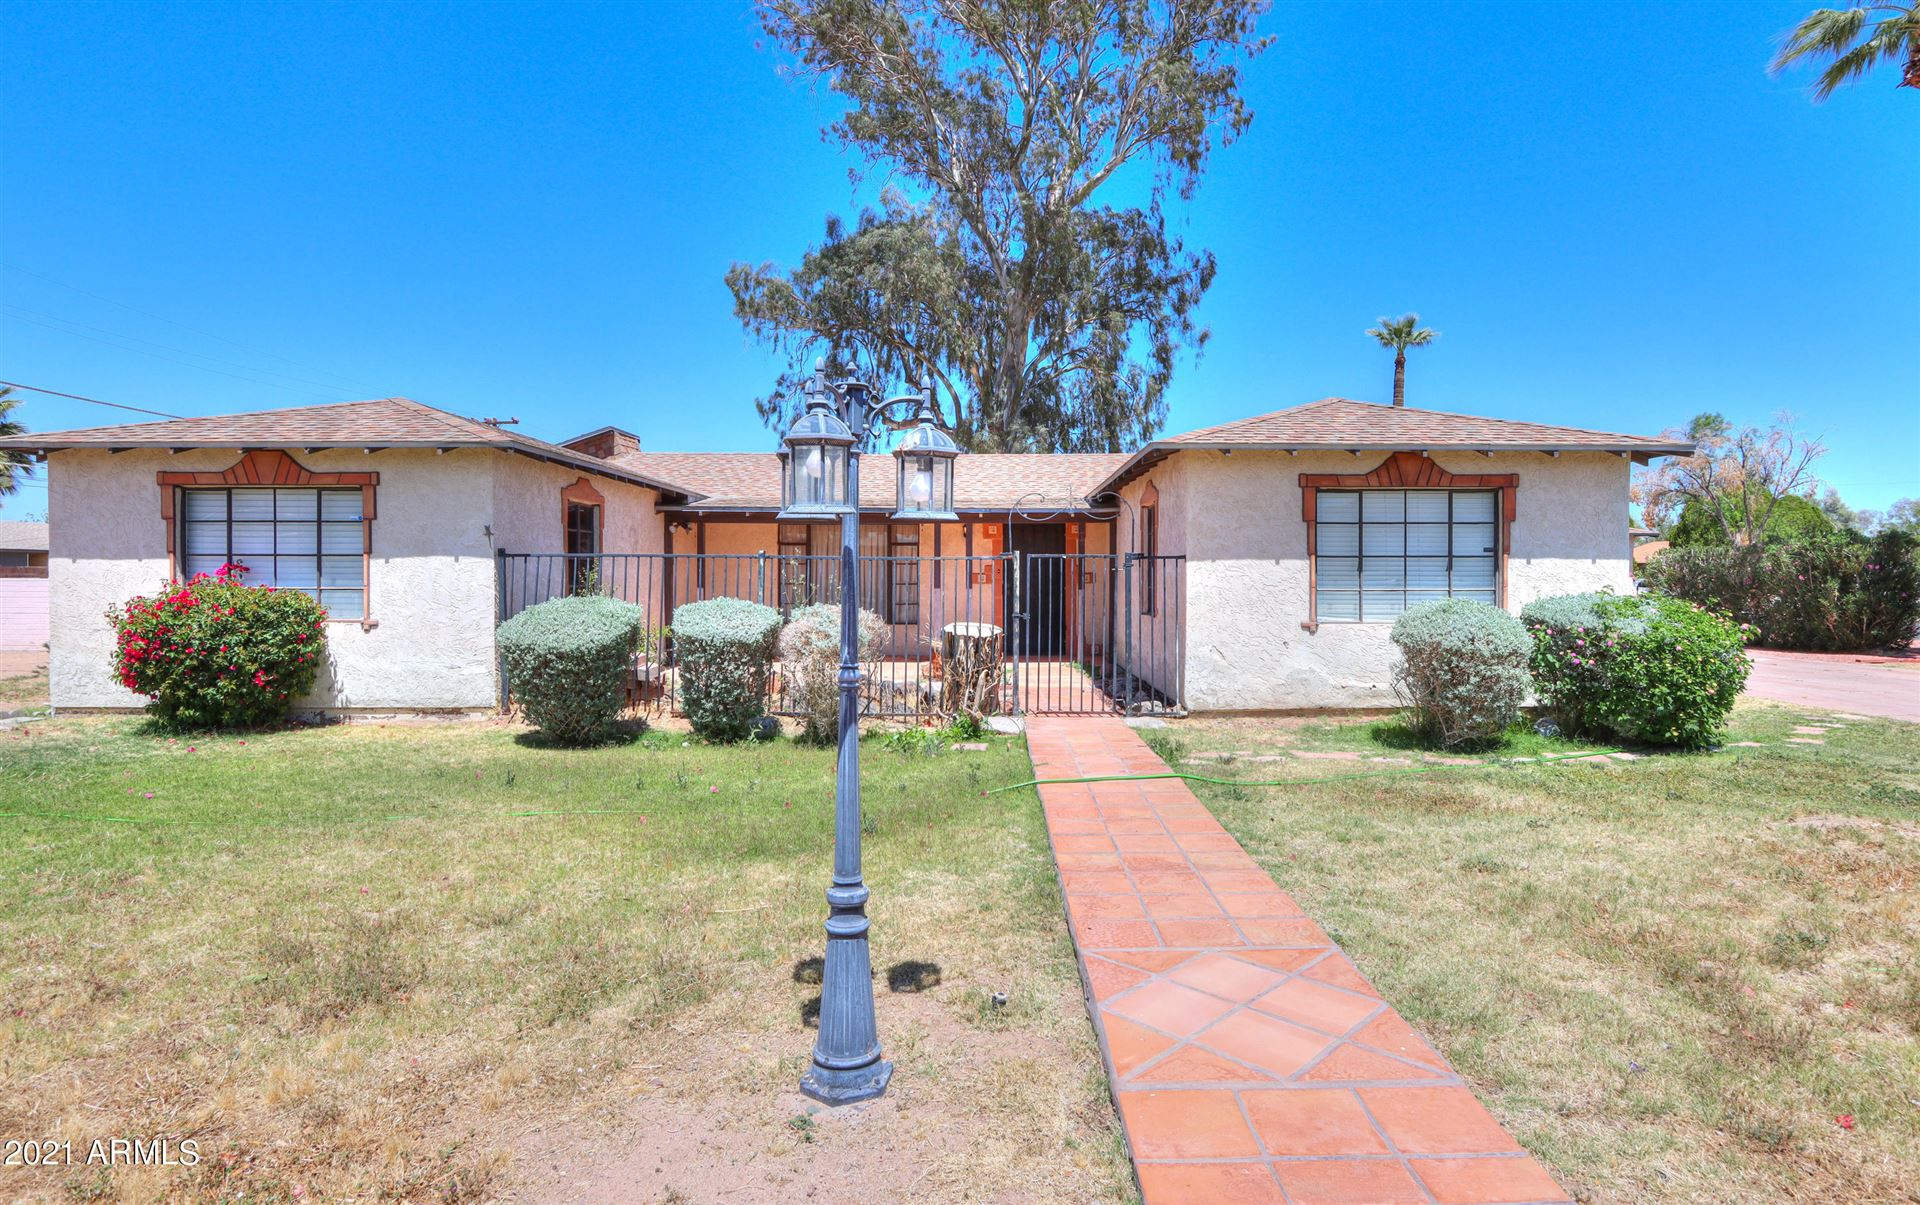 816 E 11TH Street, Casa Grande, AZ 85122 - MLS#: 6224955